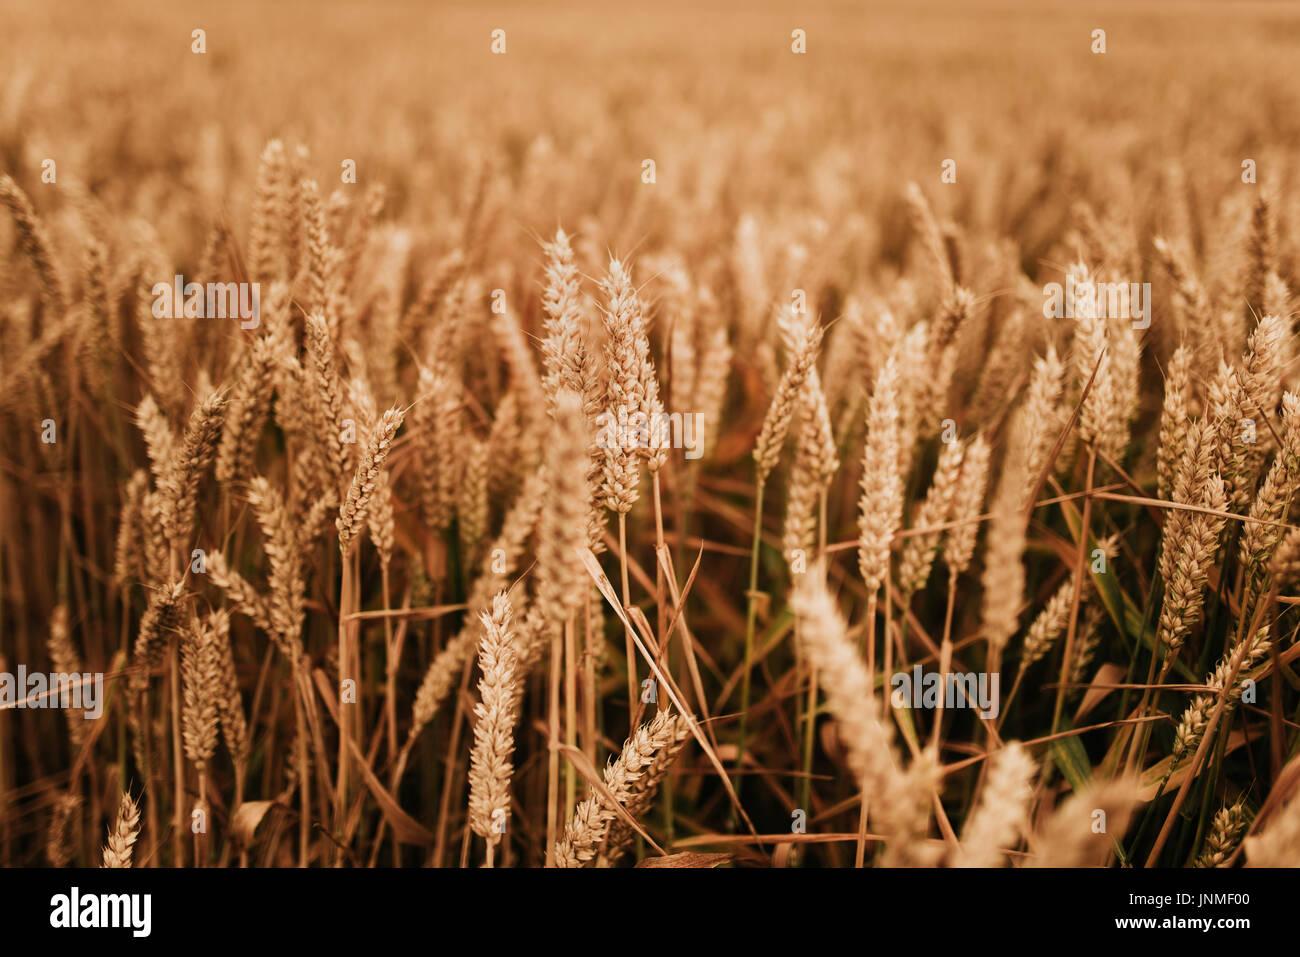 Wheat field detail - Stock Image